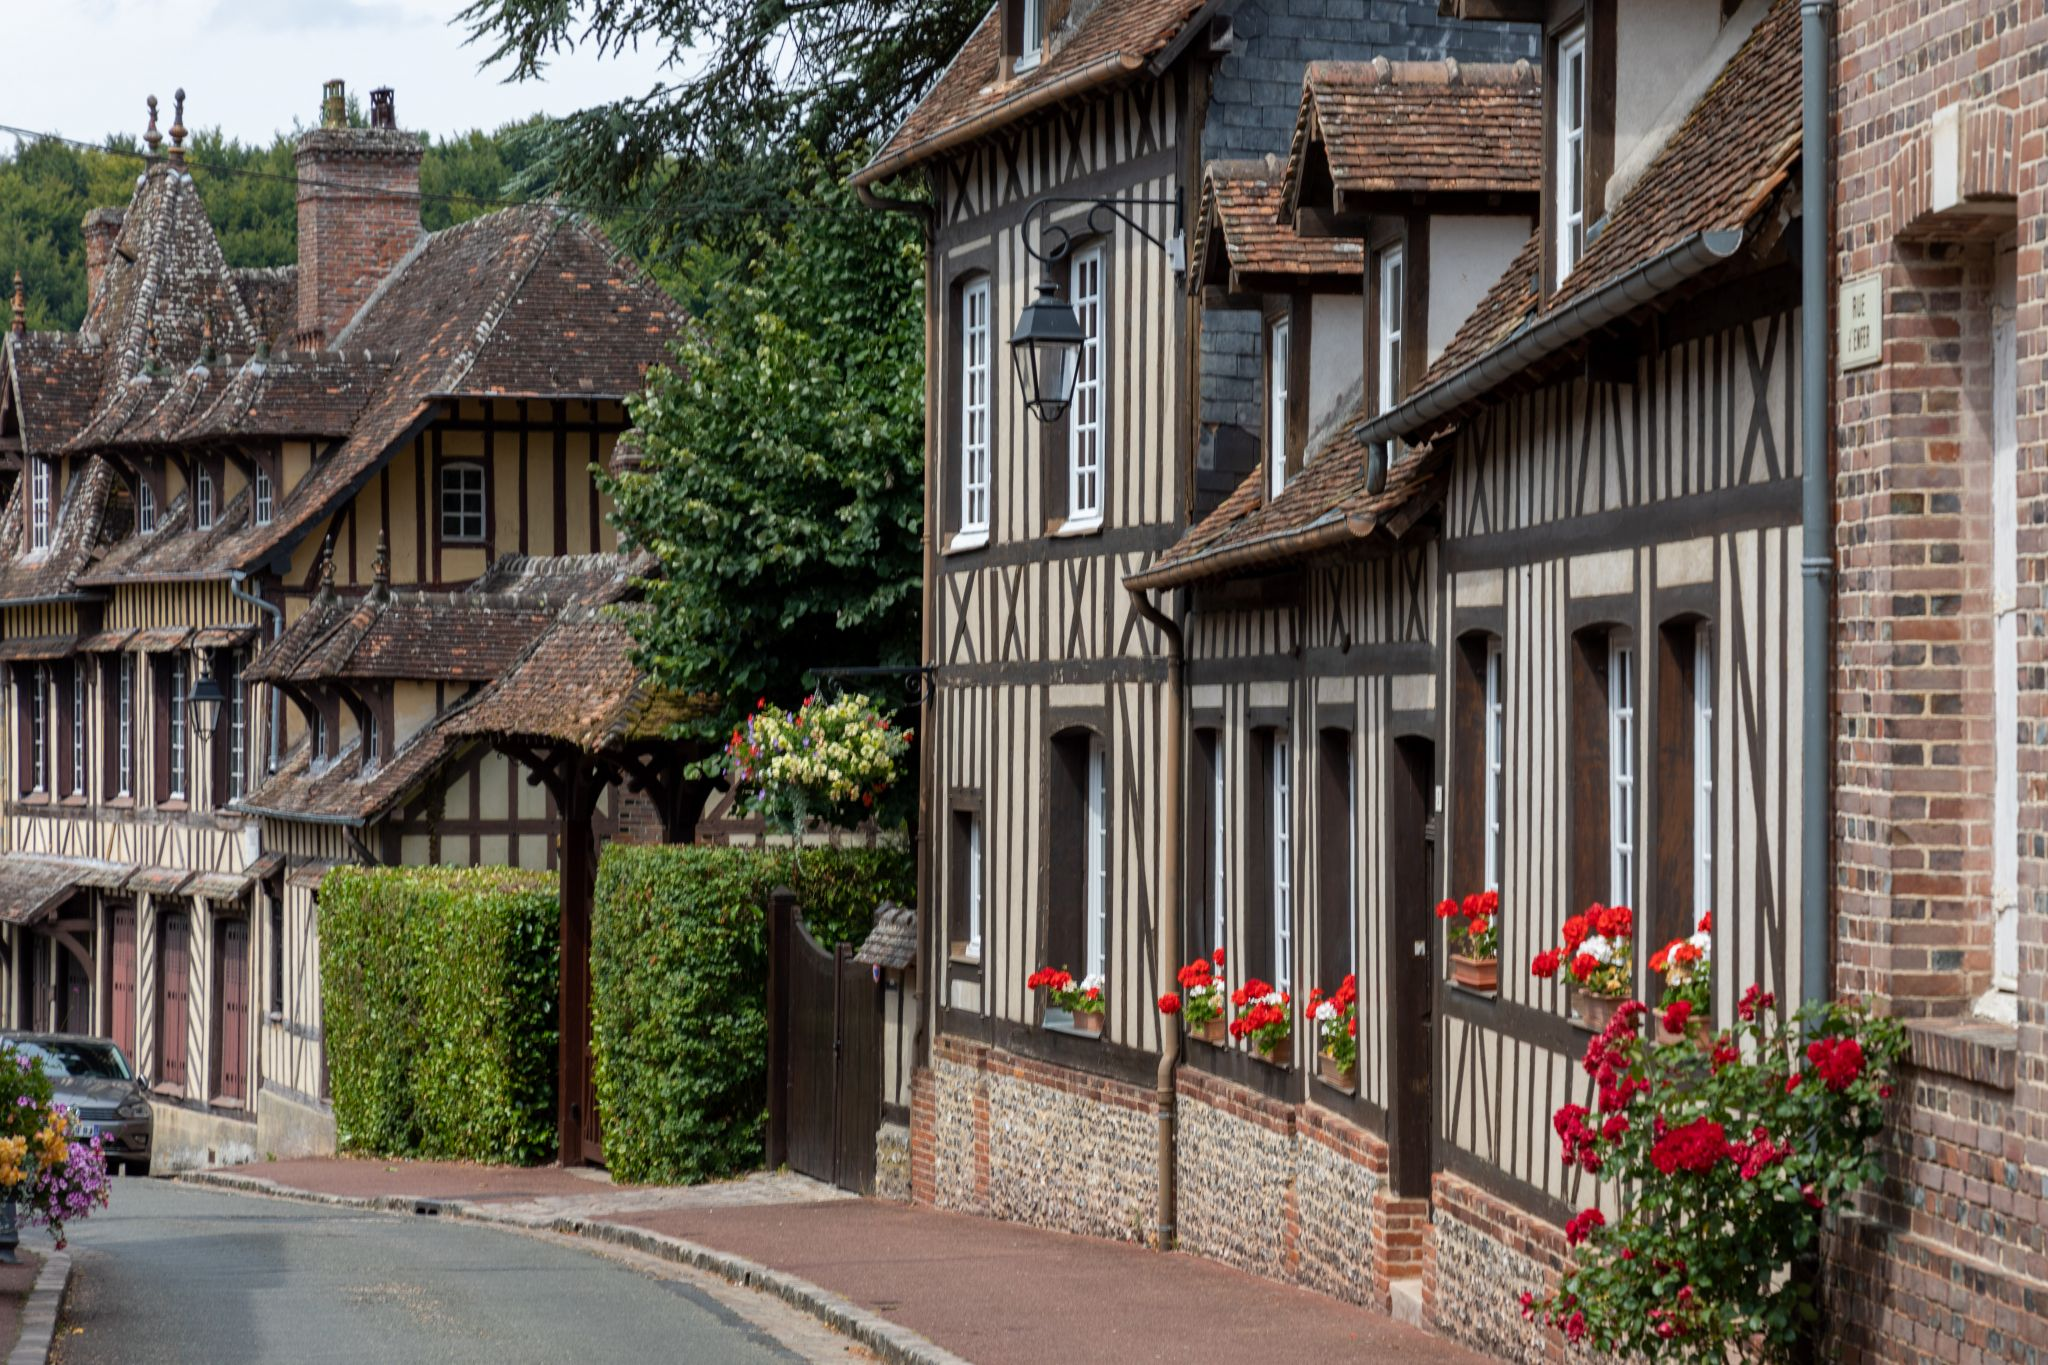 Lyons-la-Foret, France